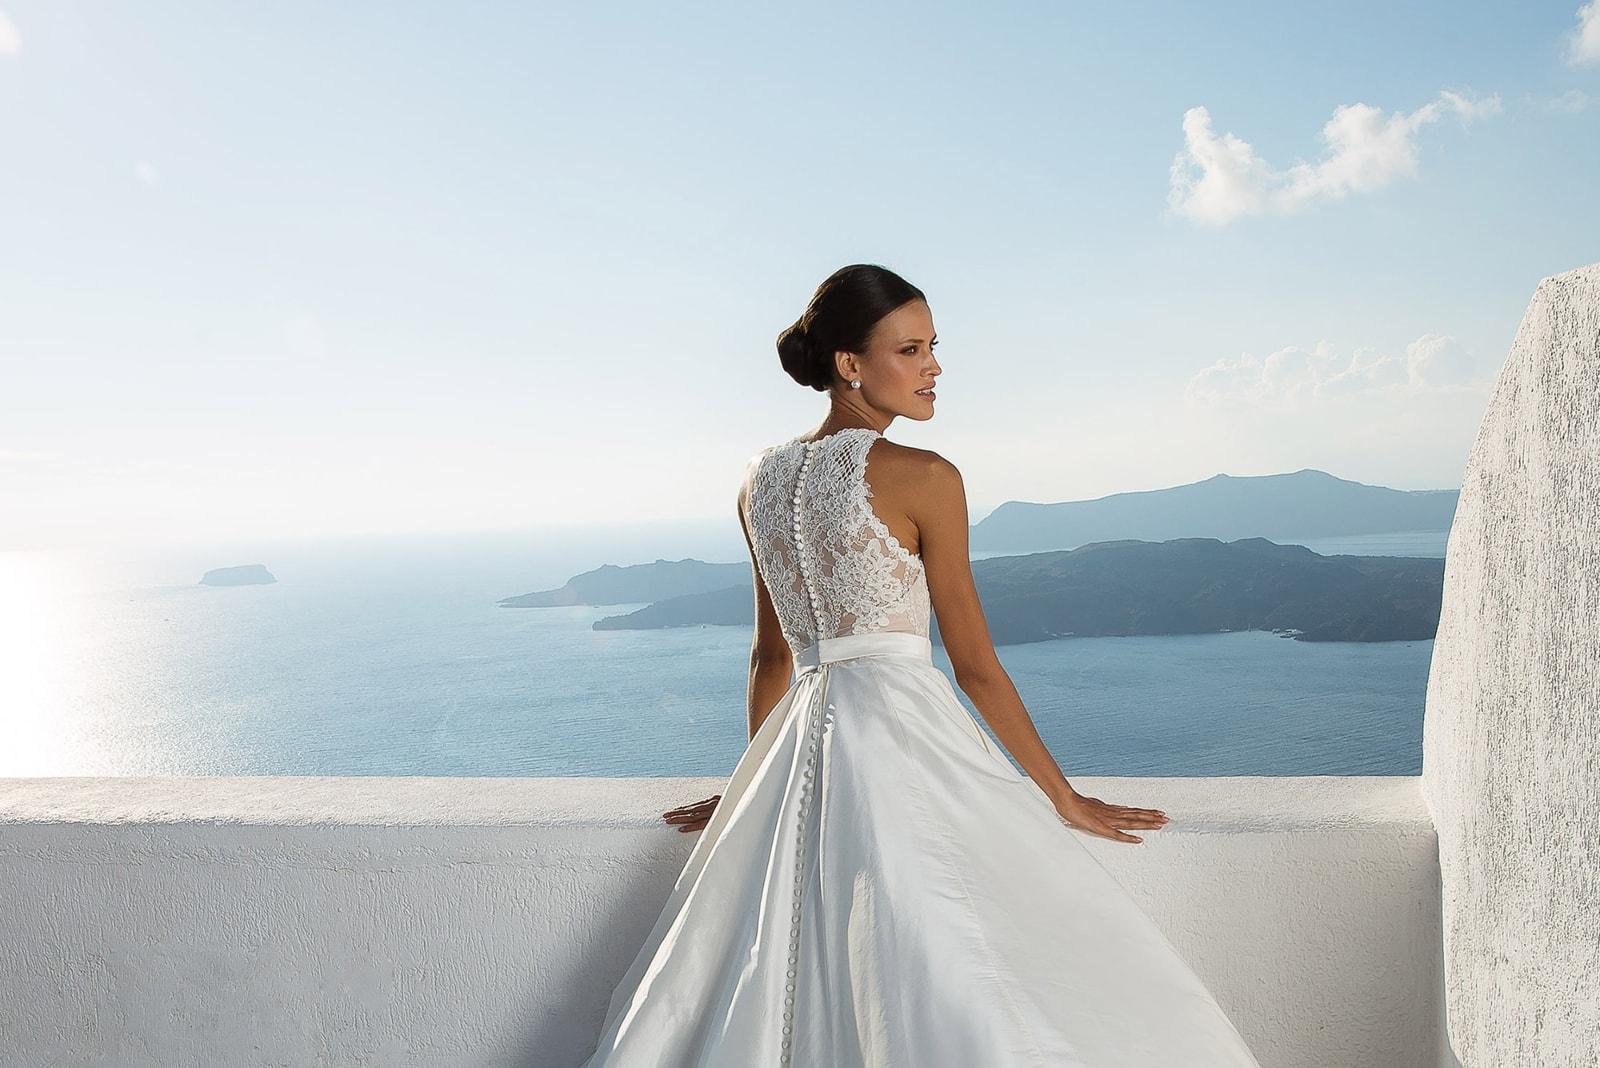 Stunning 2018 Destination Wedding Dresses By Justin